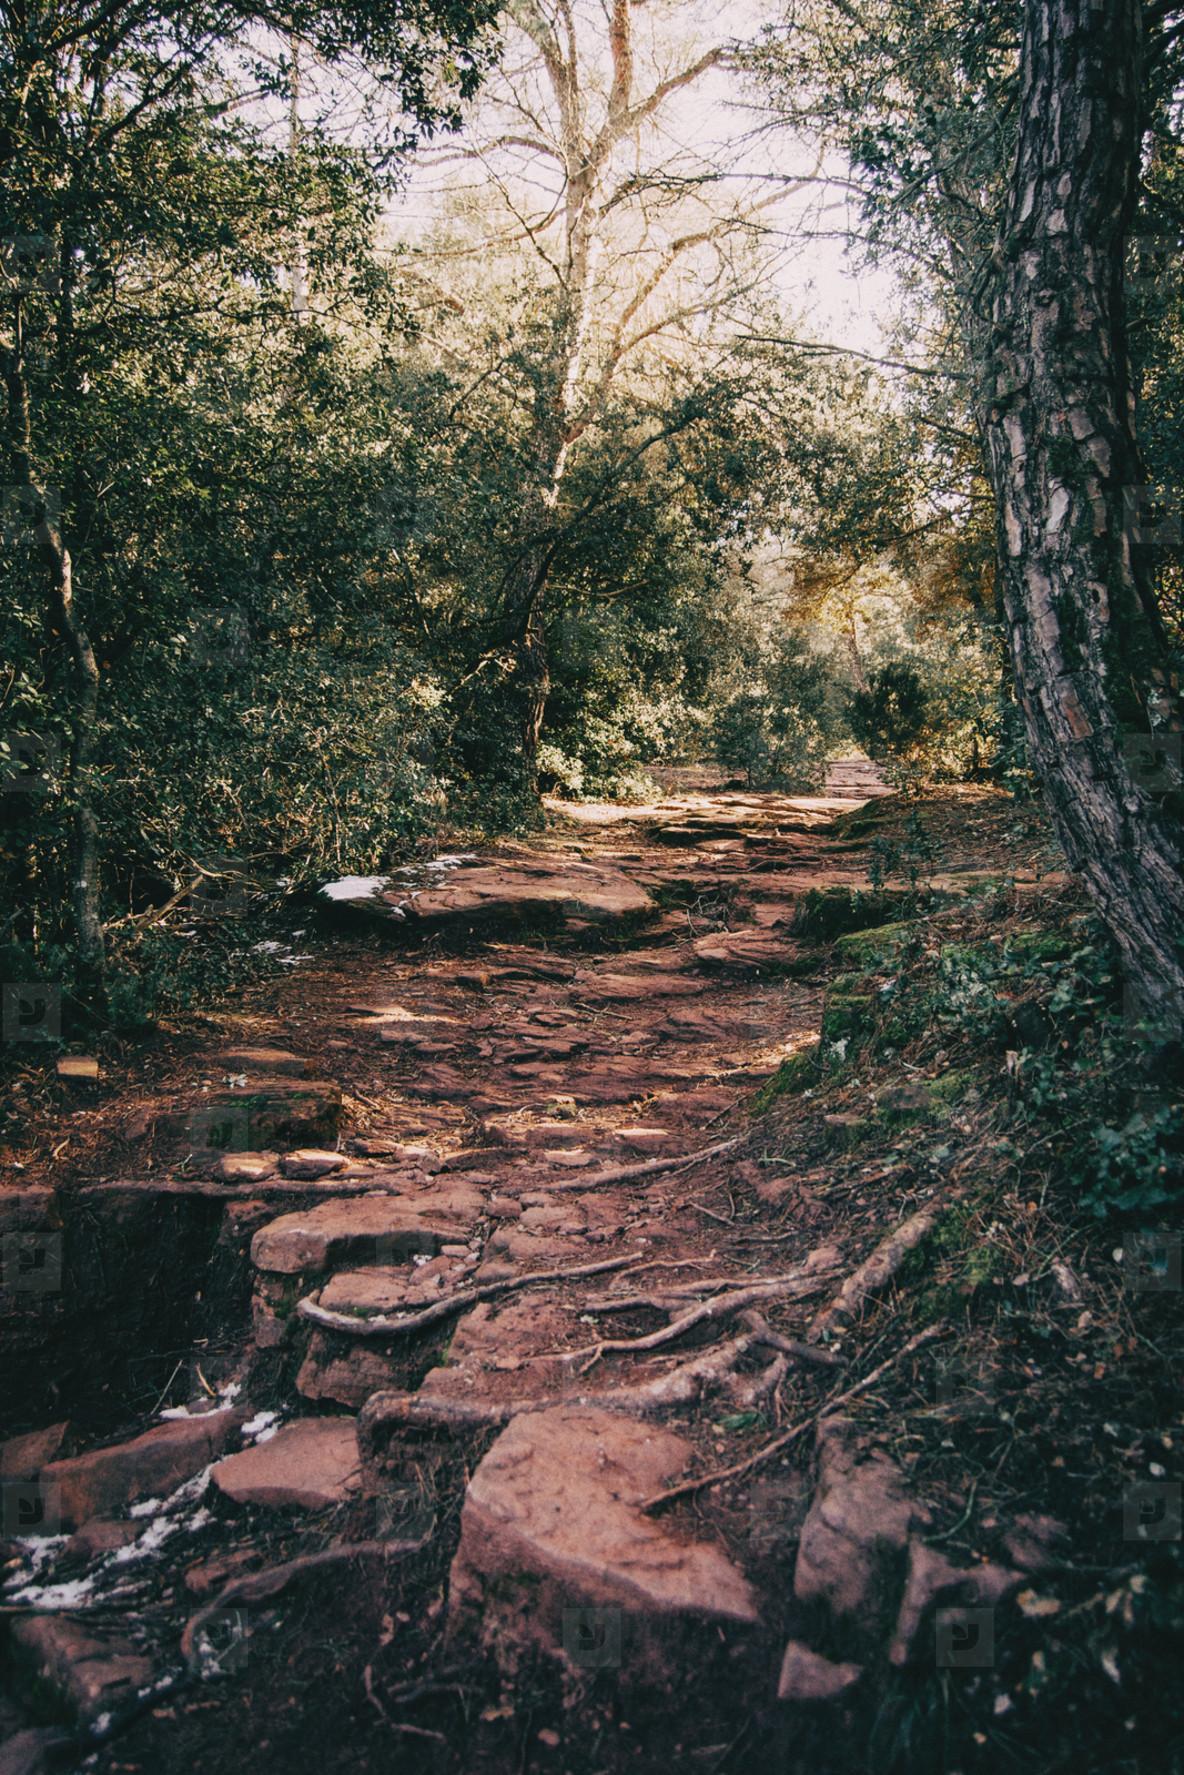 Earth trail crossing